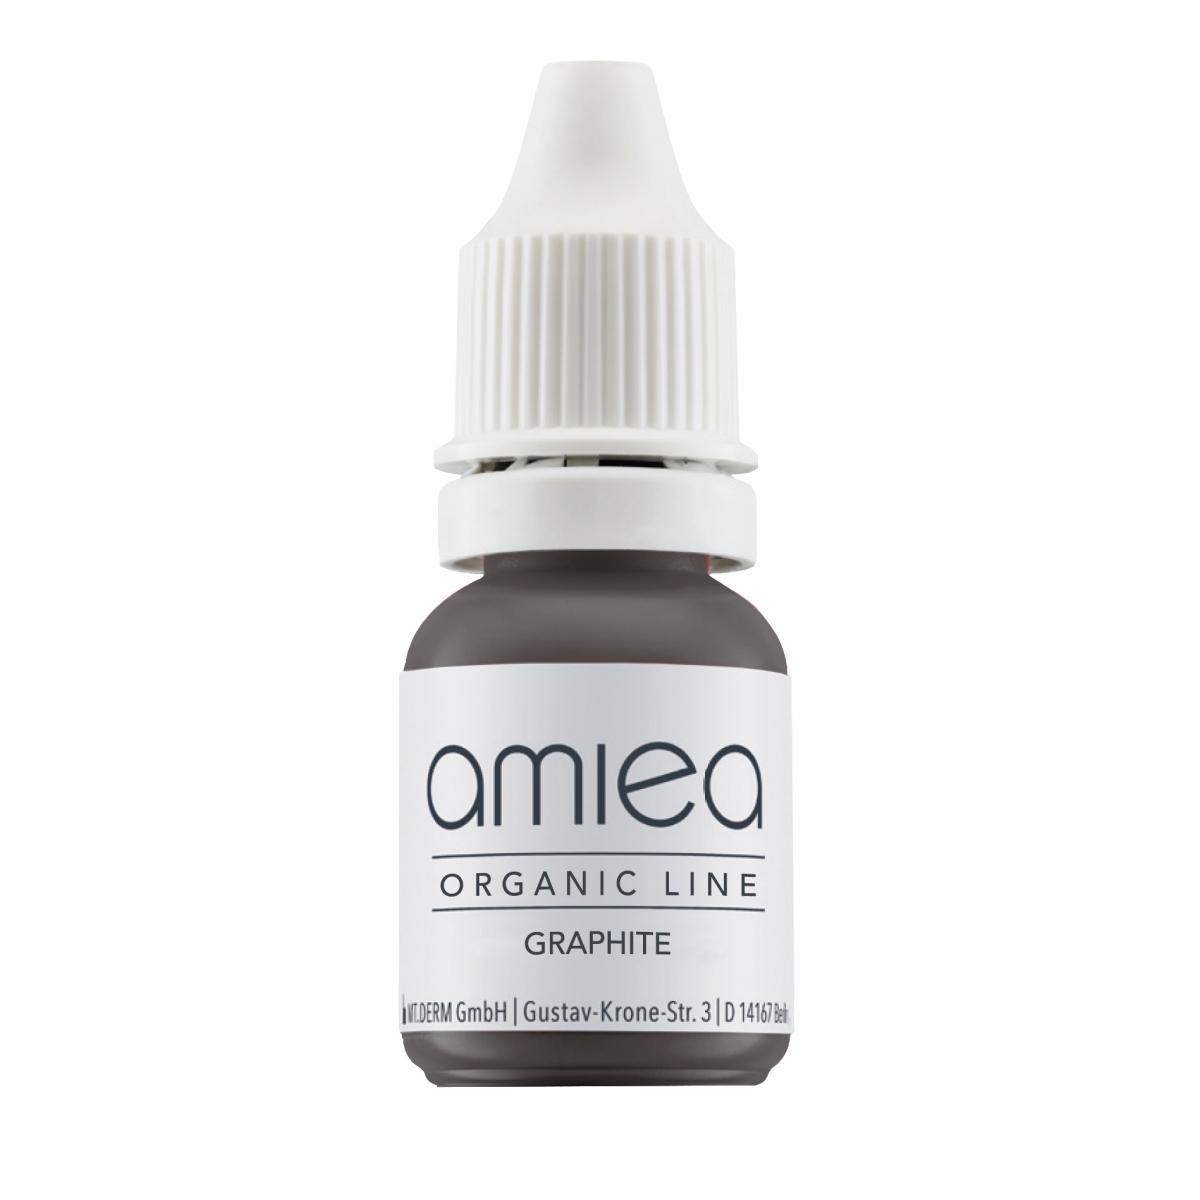 Organicline (5 ml)  - PIGMENTS AMIEA ORGANICLINE GRAPHITE, Flacon 5 ml